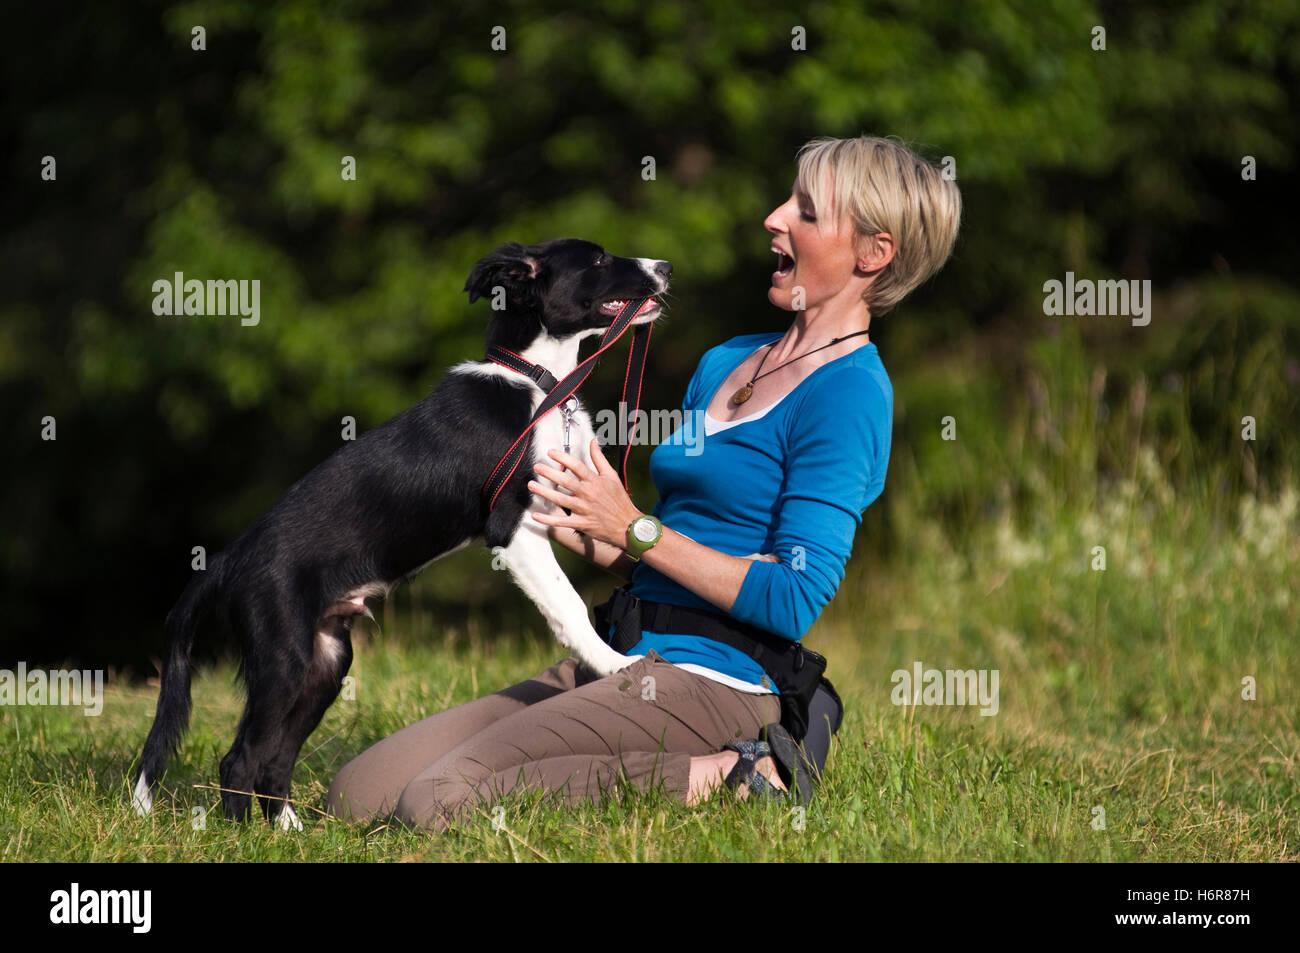 home animals - Stock Image